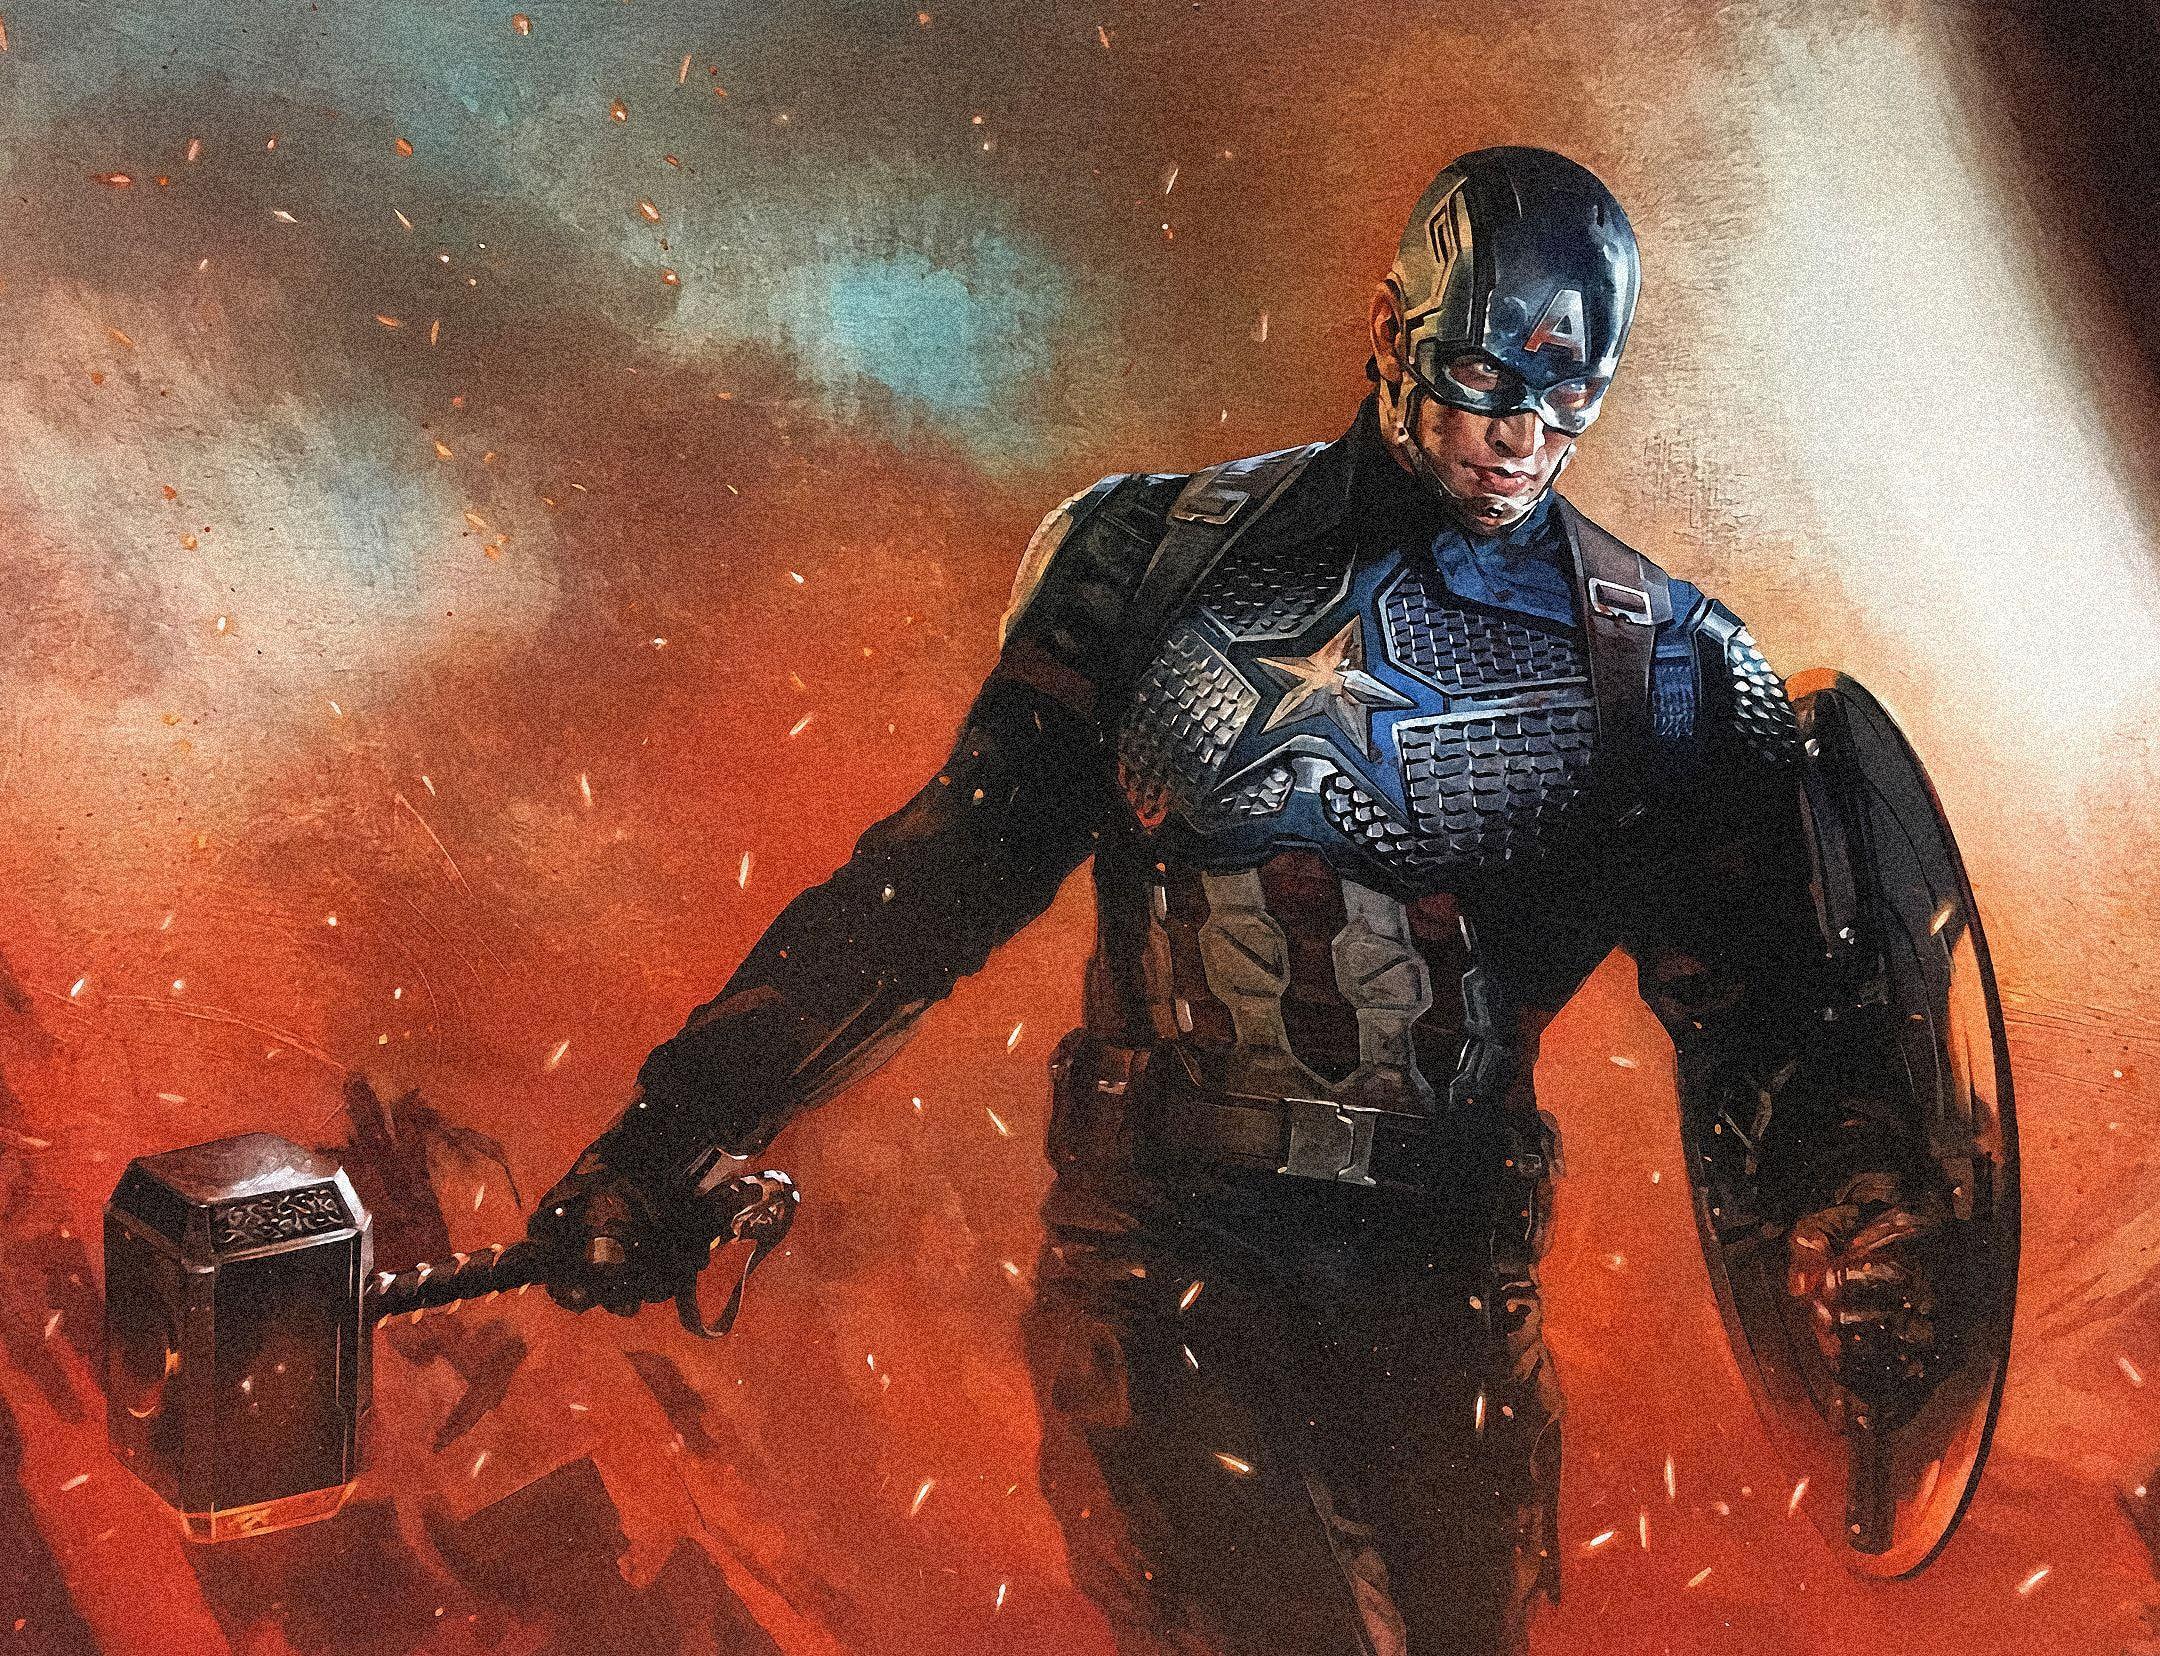 Captain America Endgame Wallpapers Top Free Captain America